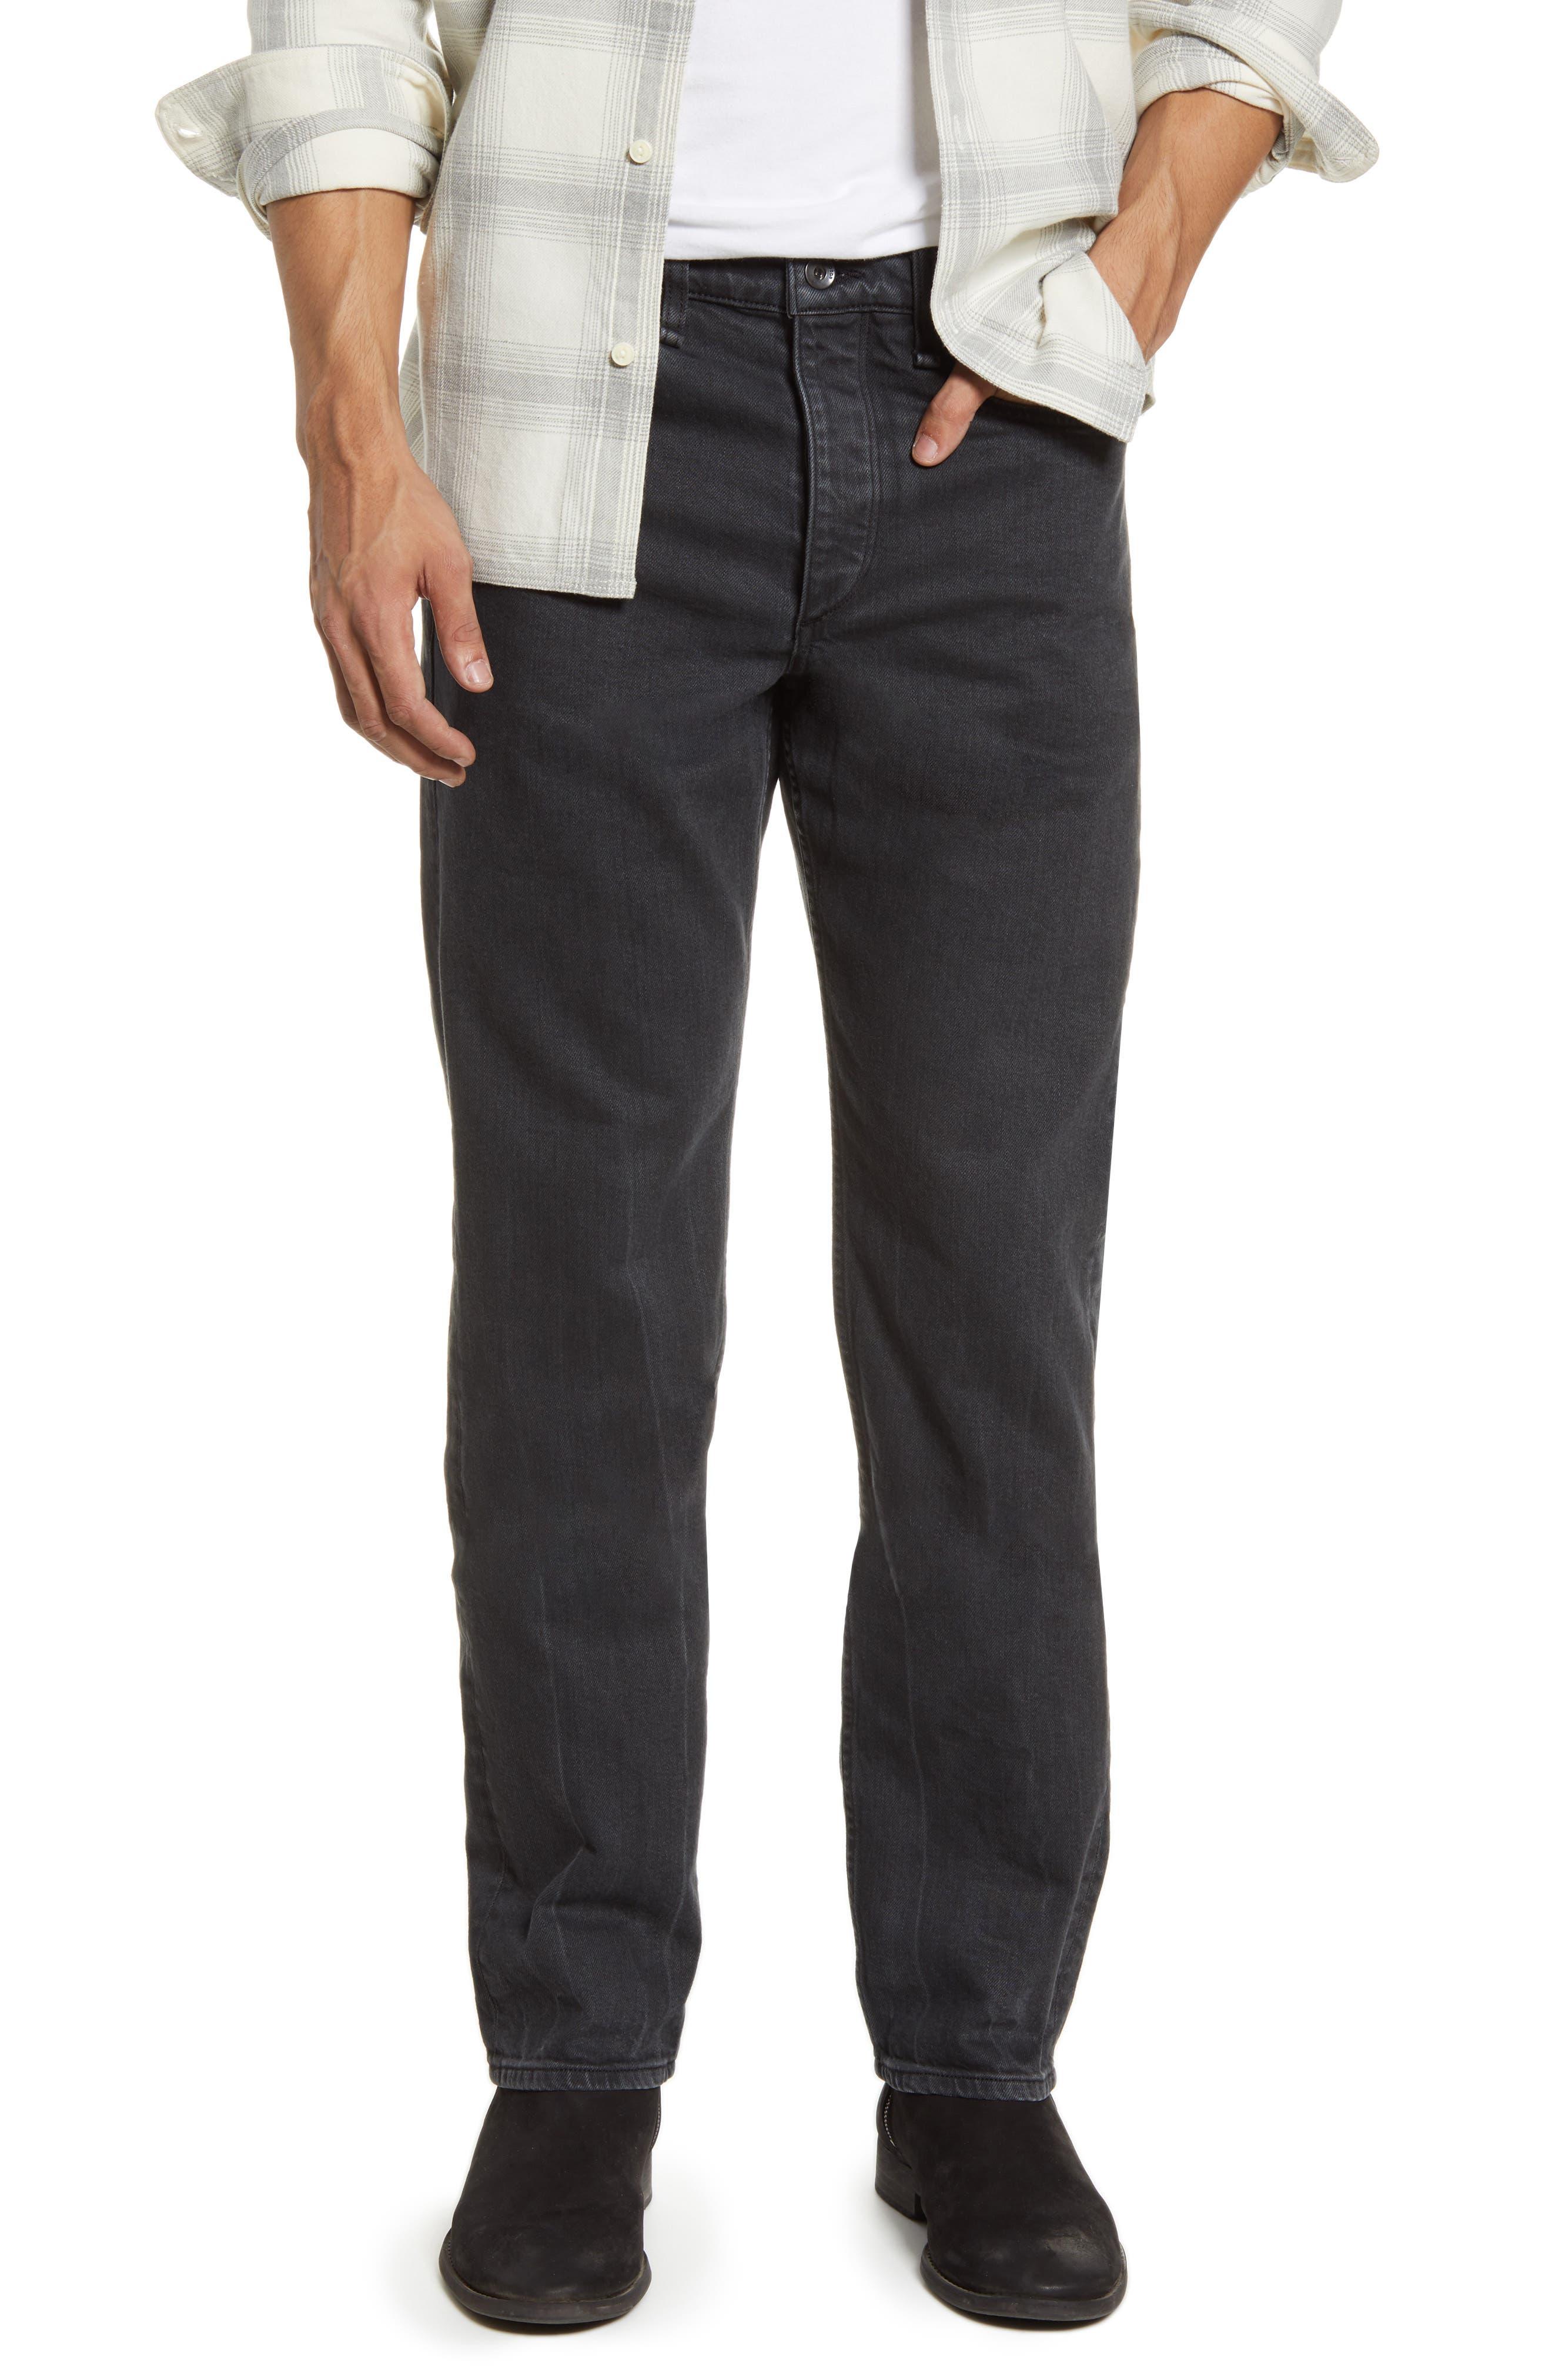 Fit 3 Slim Straight Leg Jeans by Rag & Bone